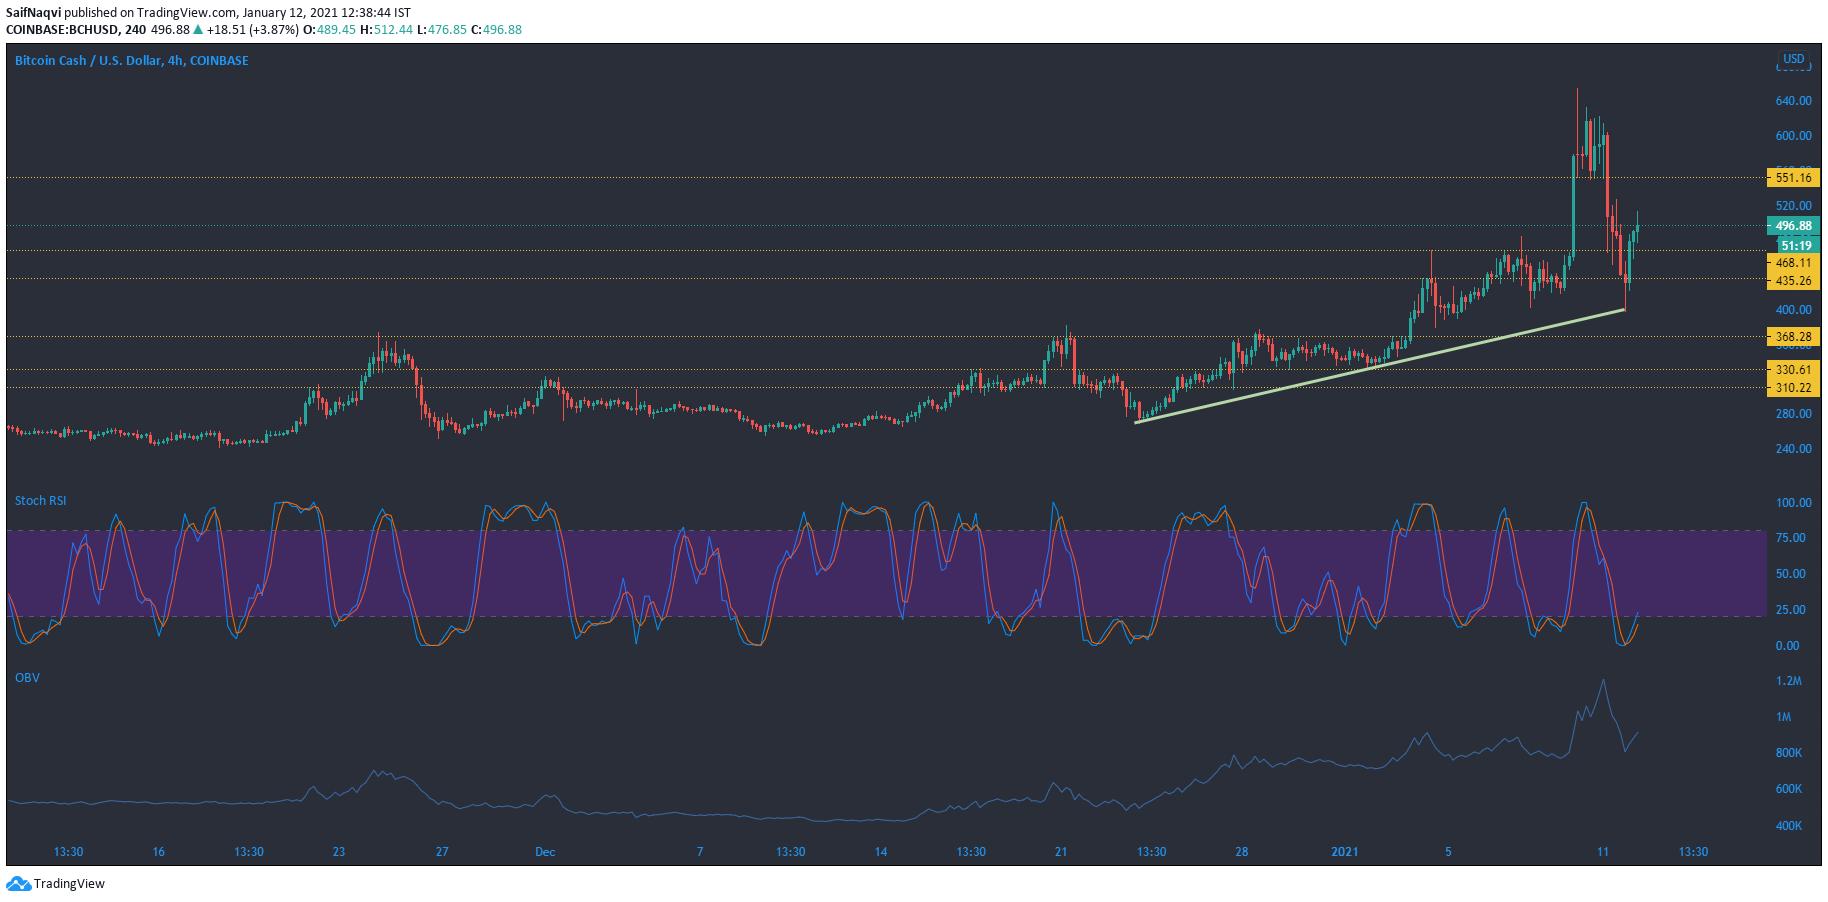 Bitcoin Cash, Basic Attention Token, Análisis de precios de DigiByte: 12 de enero